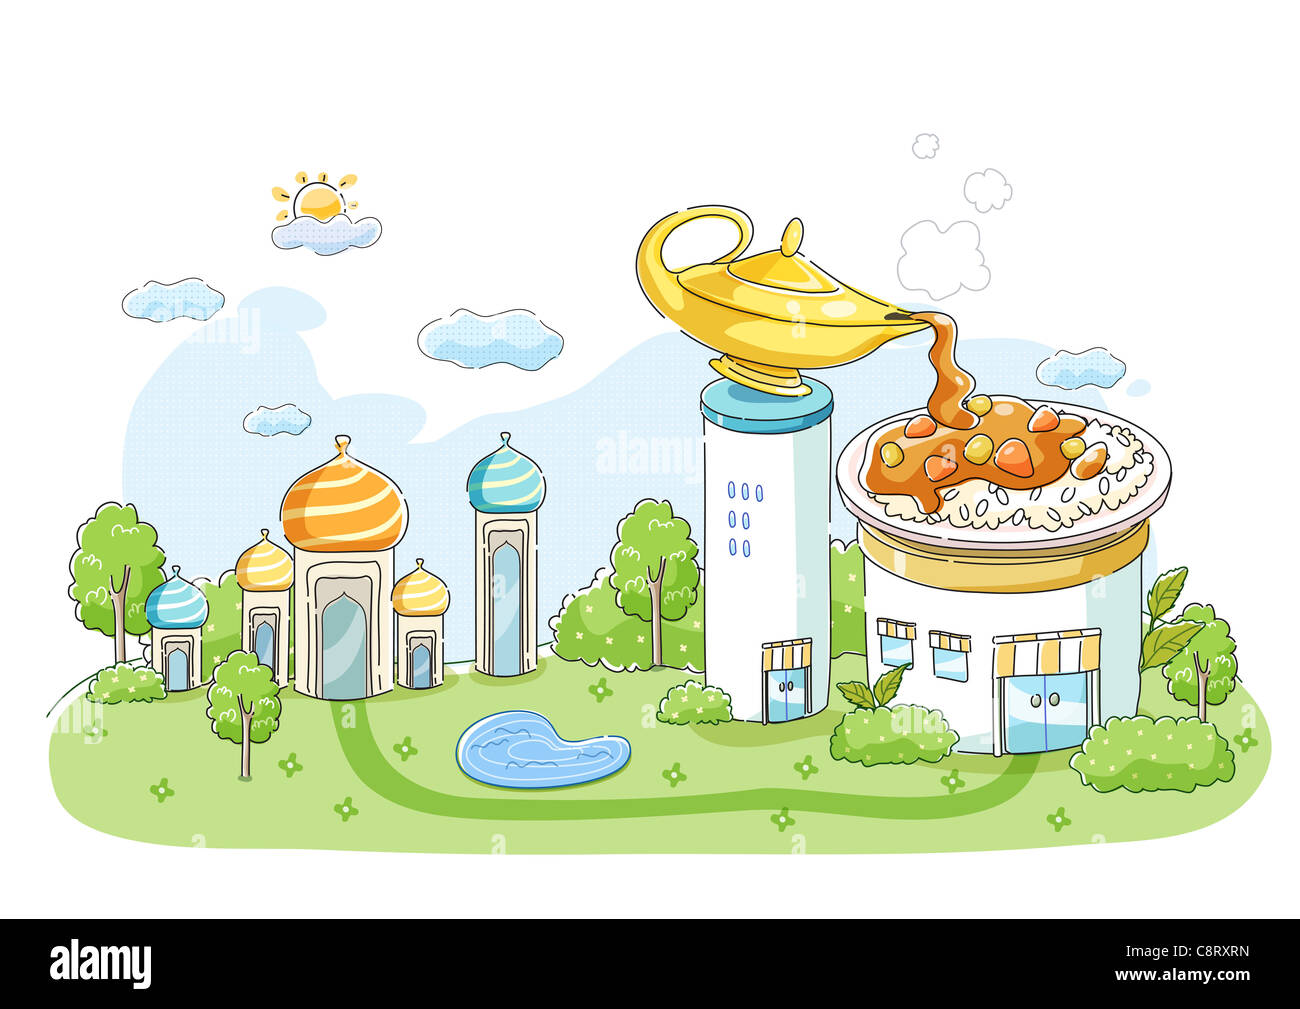 Magic lamp with castles around - Stock Image